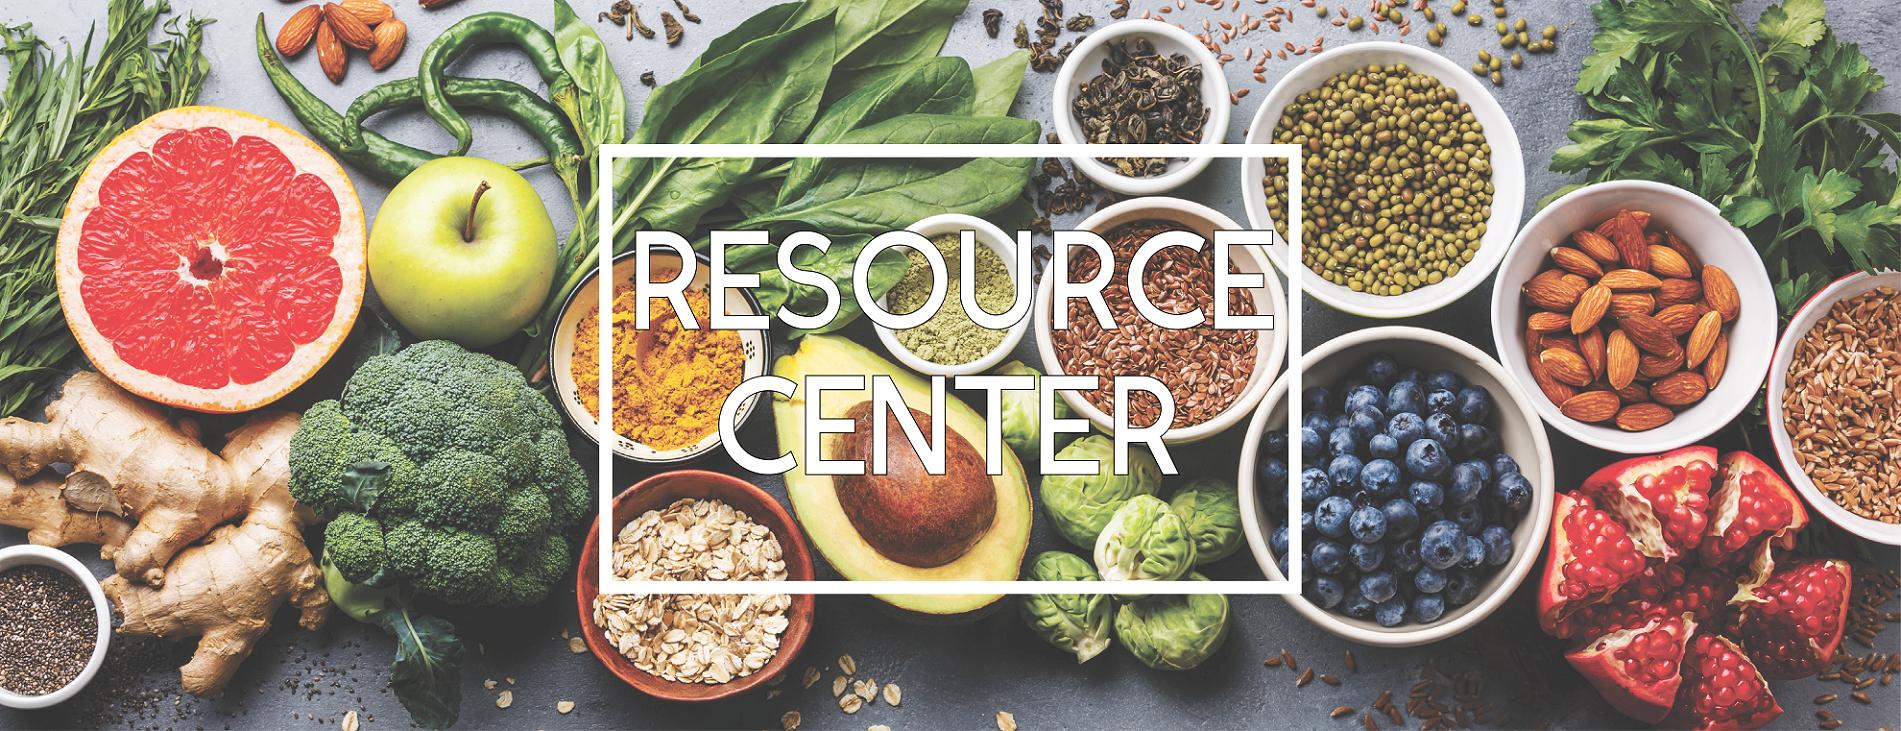 Michigan Healthy Food Resource Center